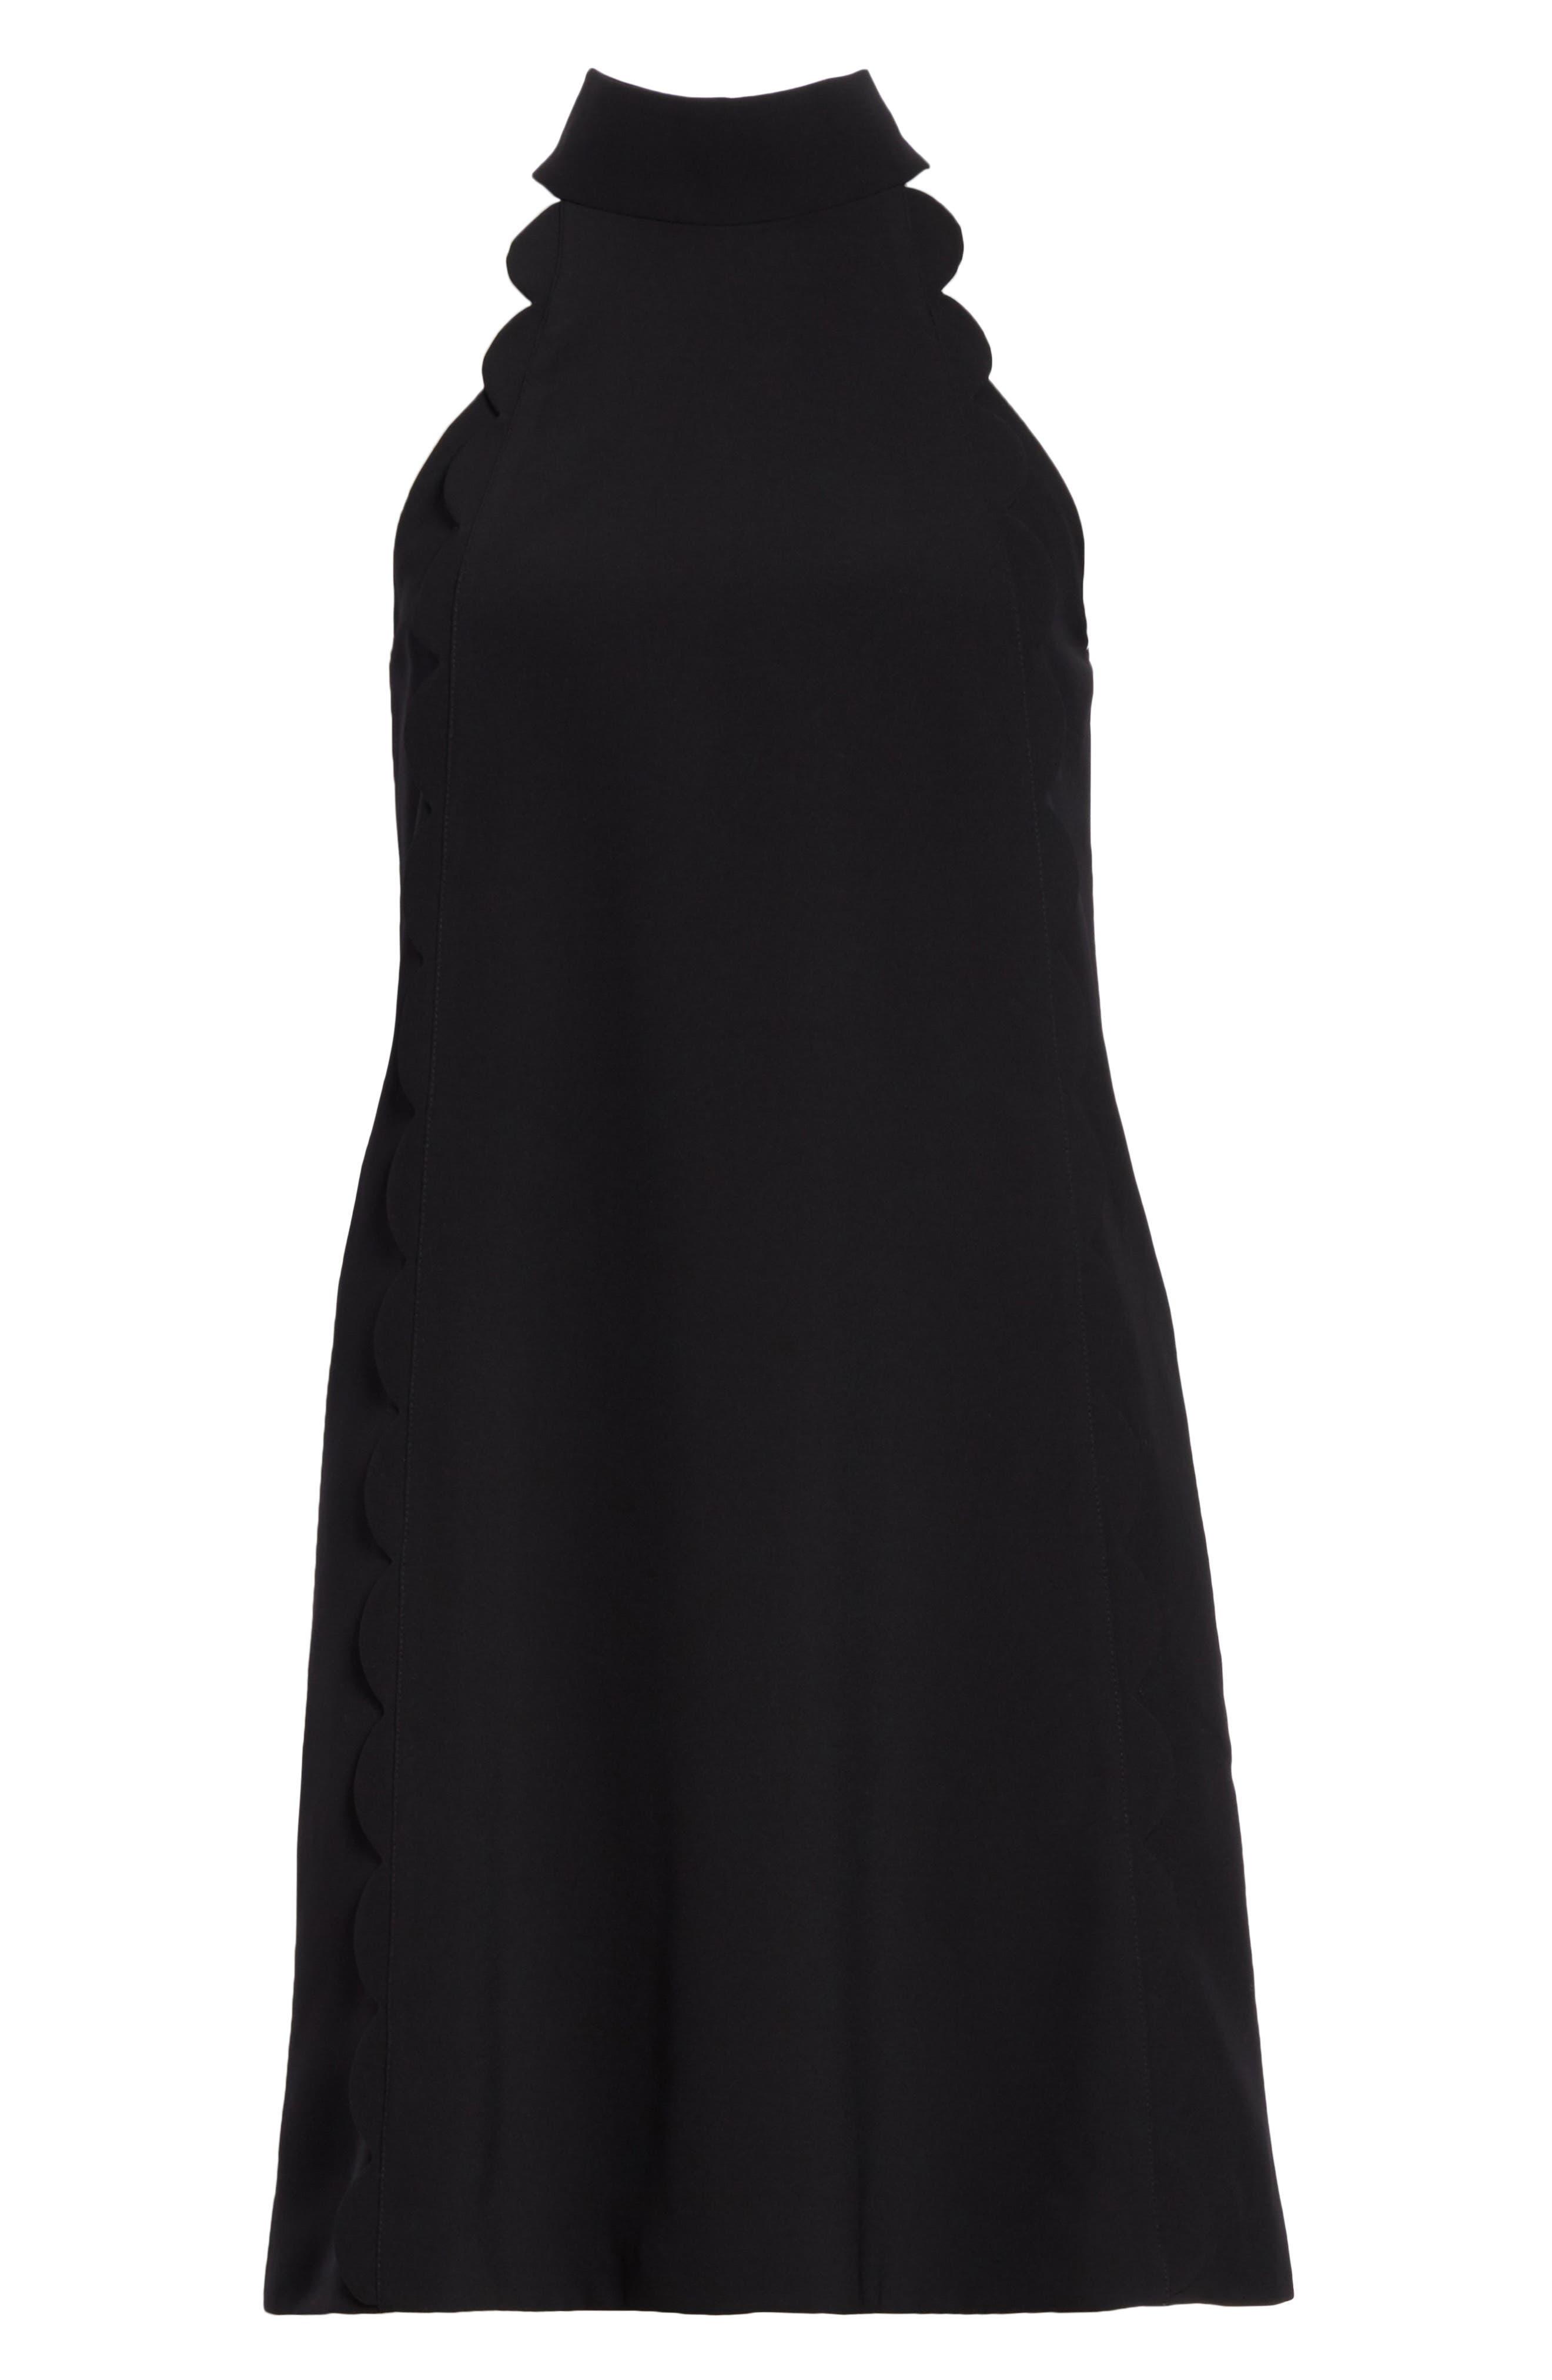 Torrii High Neck Tunic Dress,                             Alternate thumbnail 6, color,                             BLACK